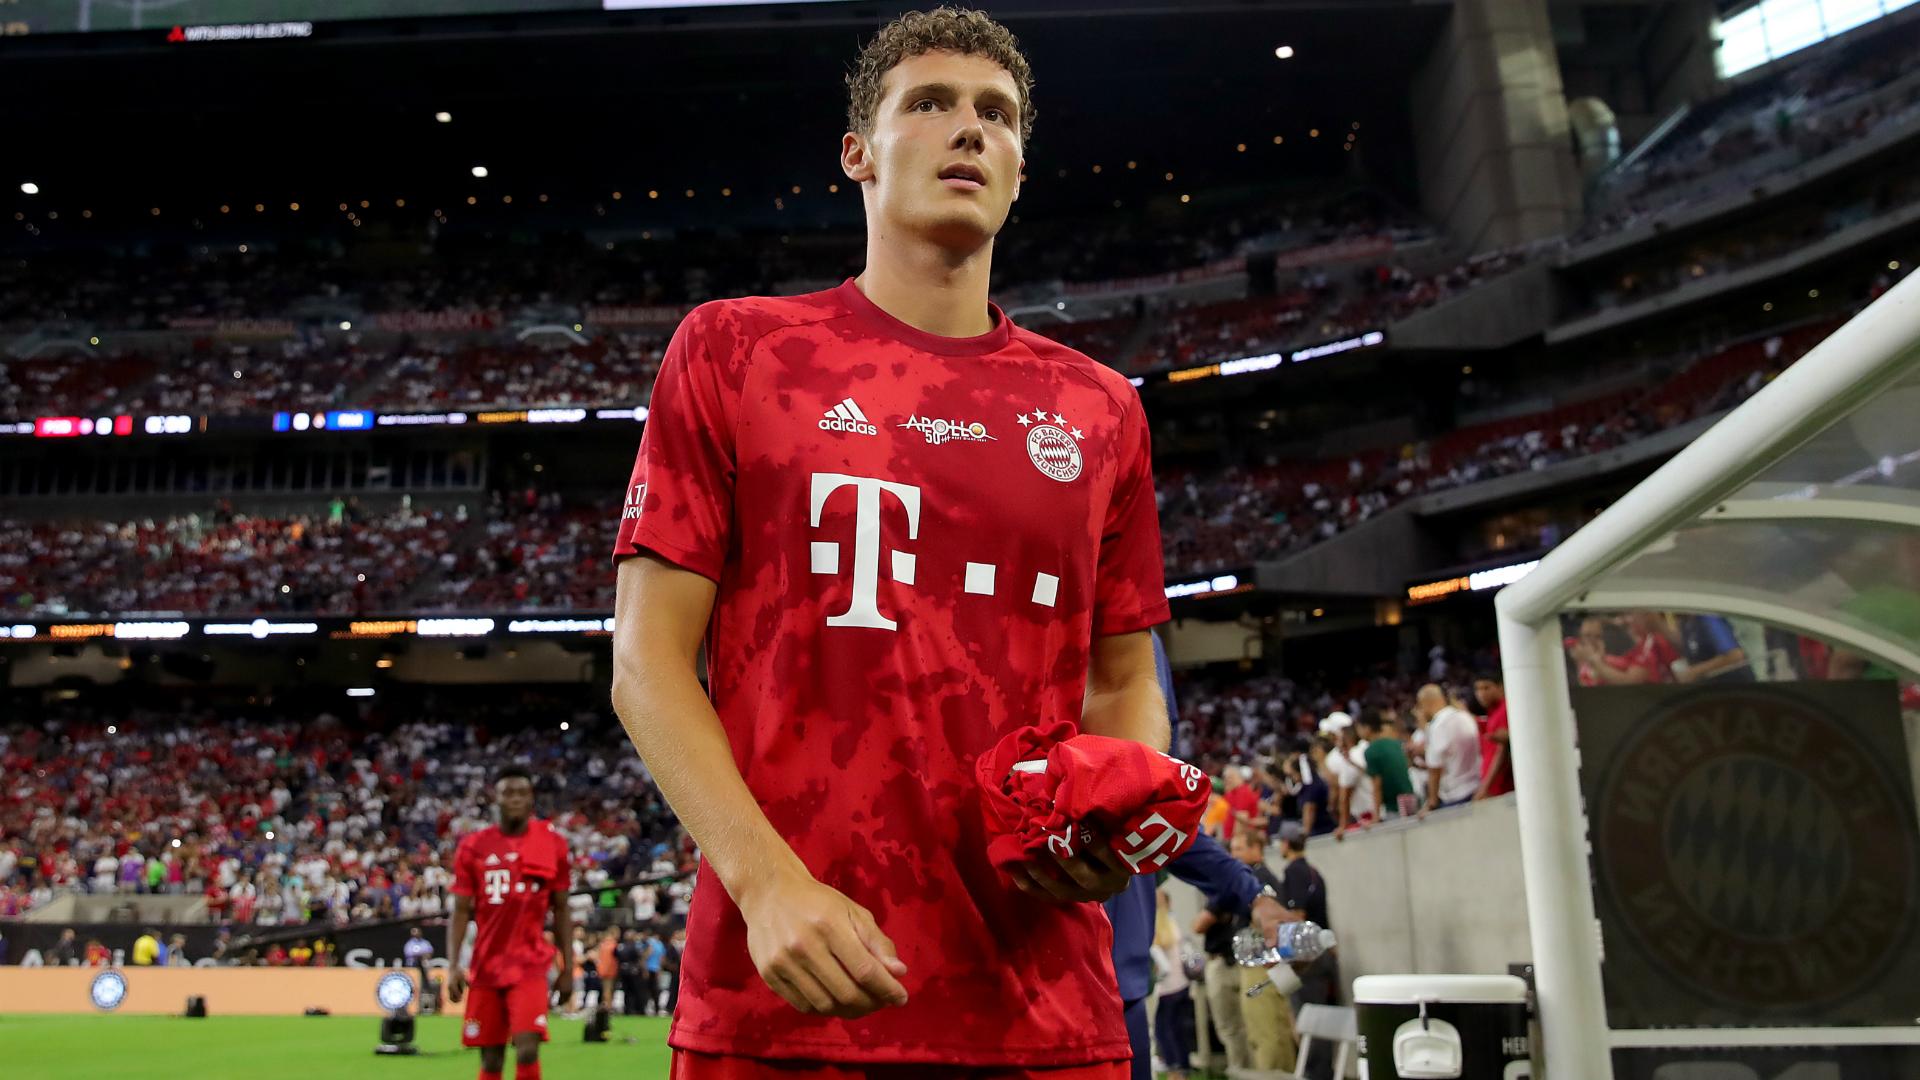 'I have a lot of confidence' - Pavard expecting big season at Bayern